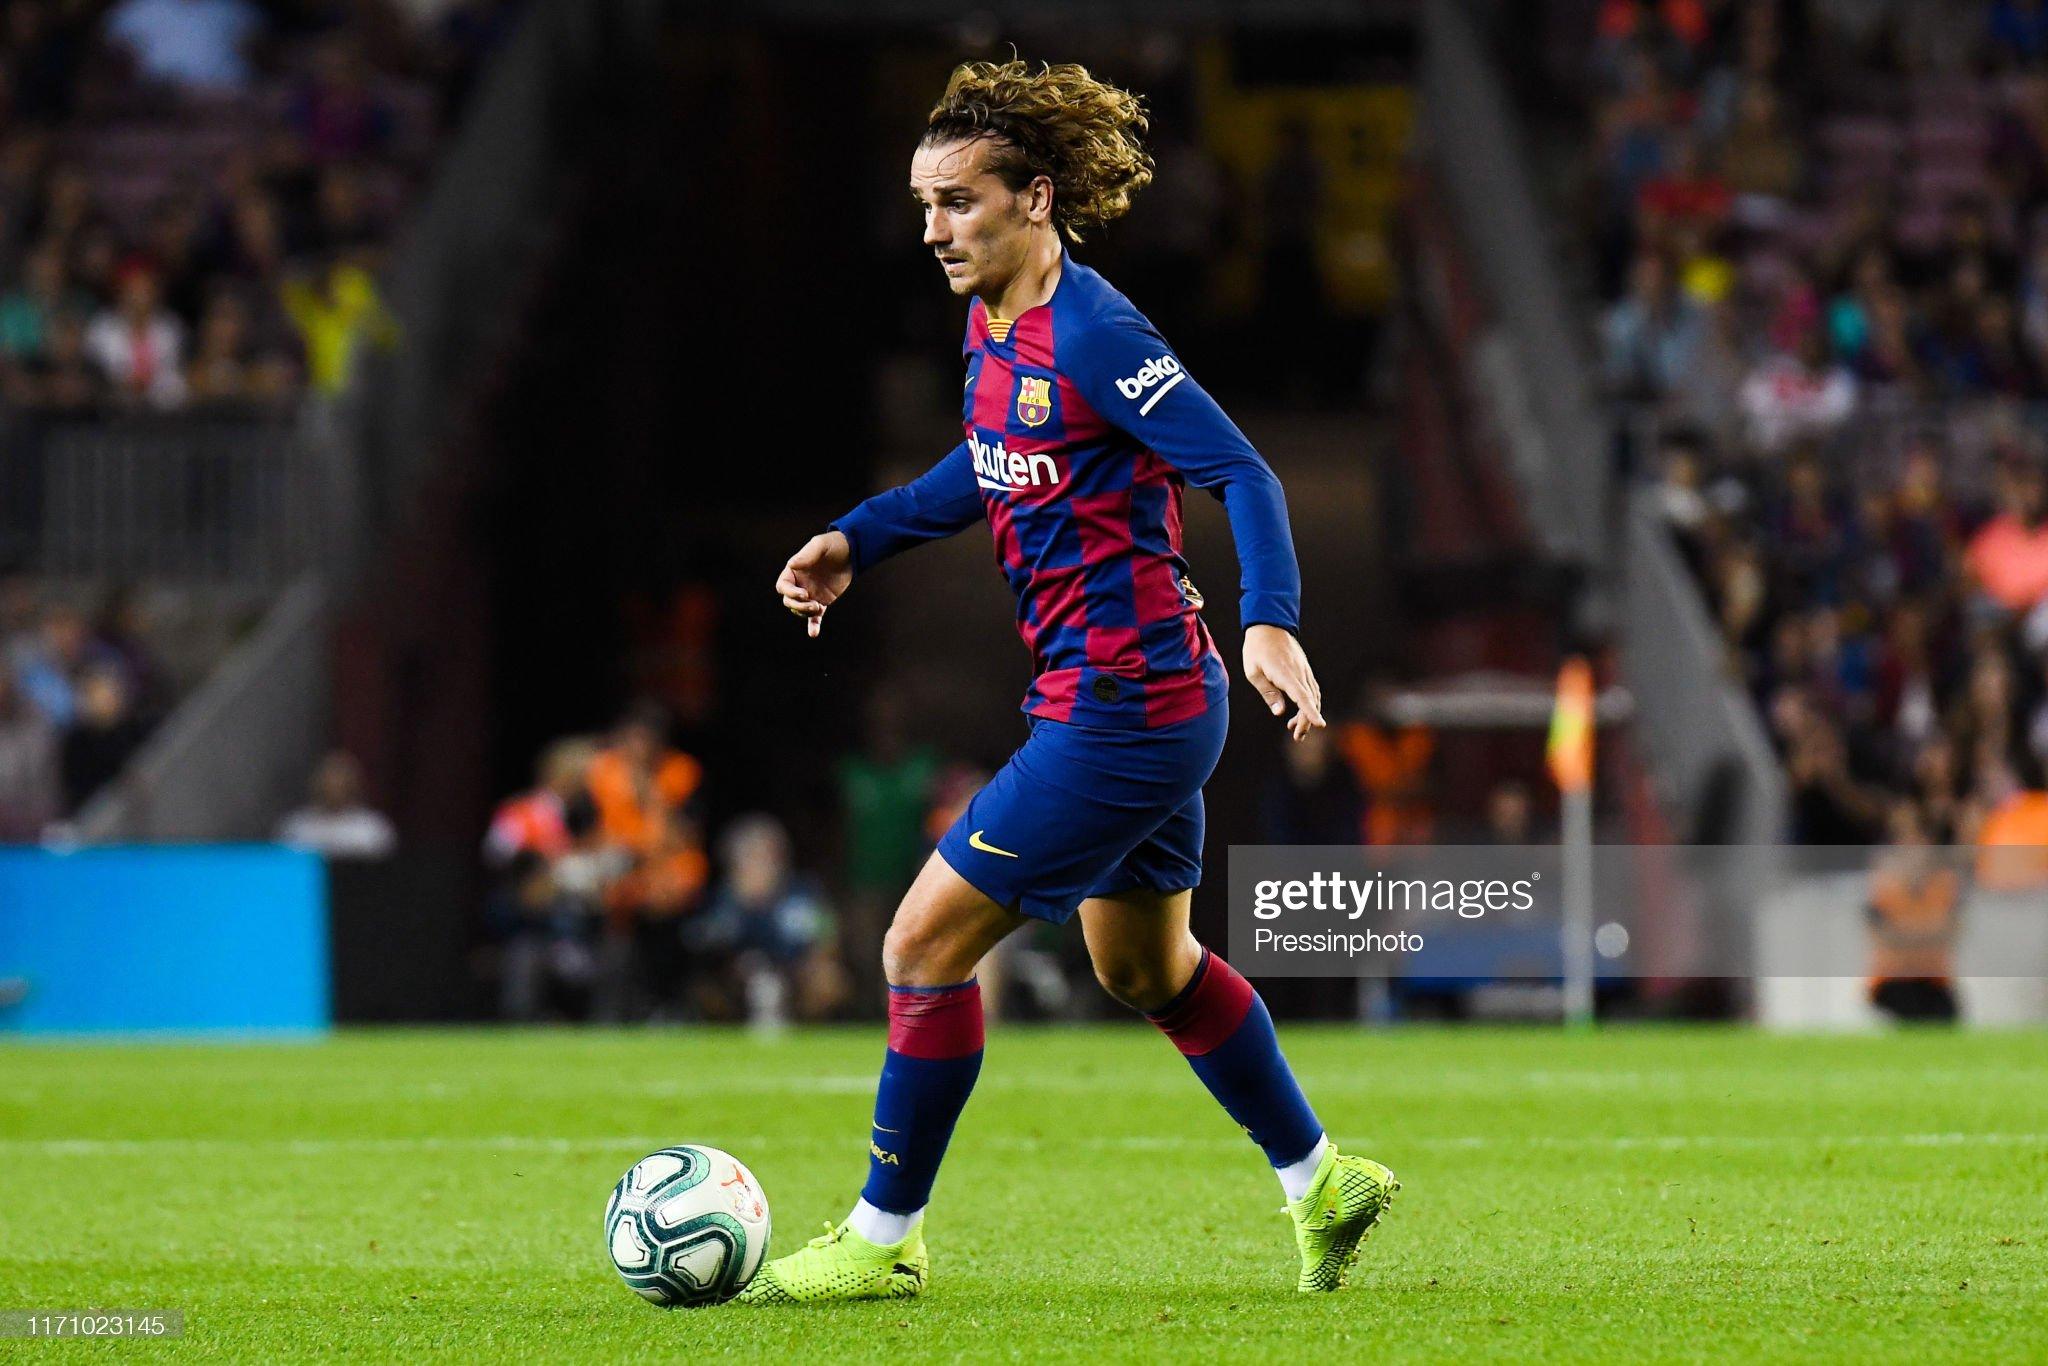 صور مباراة : برشلونة - فياريال 2-1 ( 24-09-2019 )  Antoine-griezmann-of-fc-barcelona-during-the-liga-match-between-and-picture-id1171023145?s=2048x2048